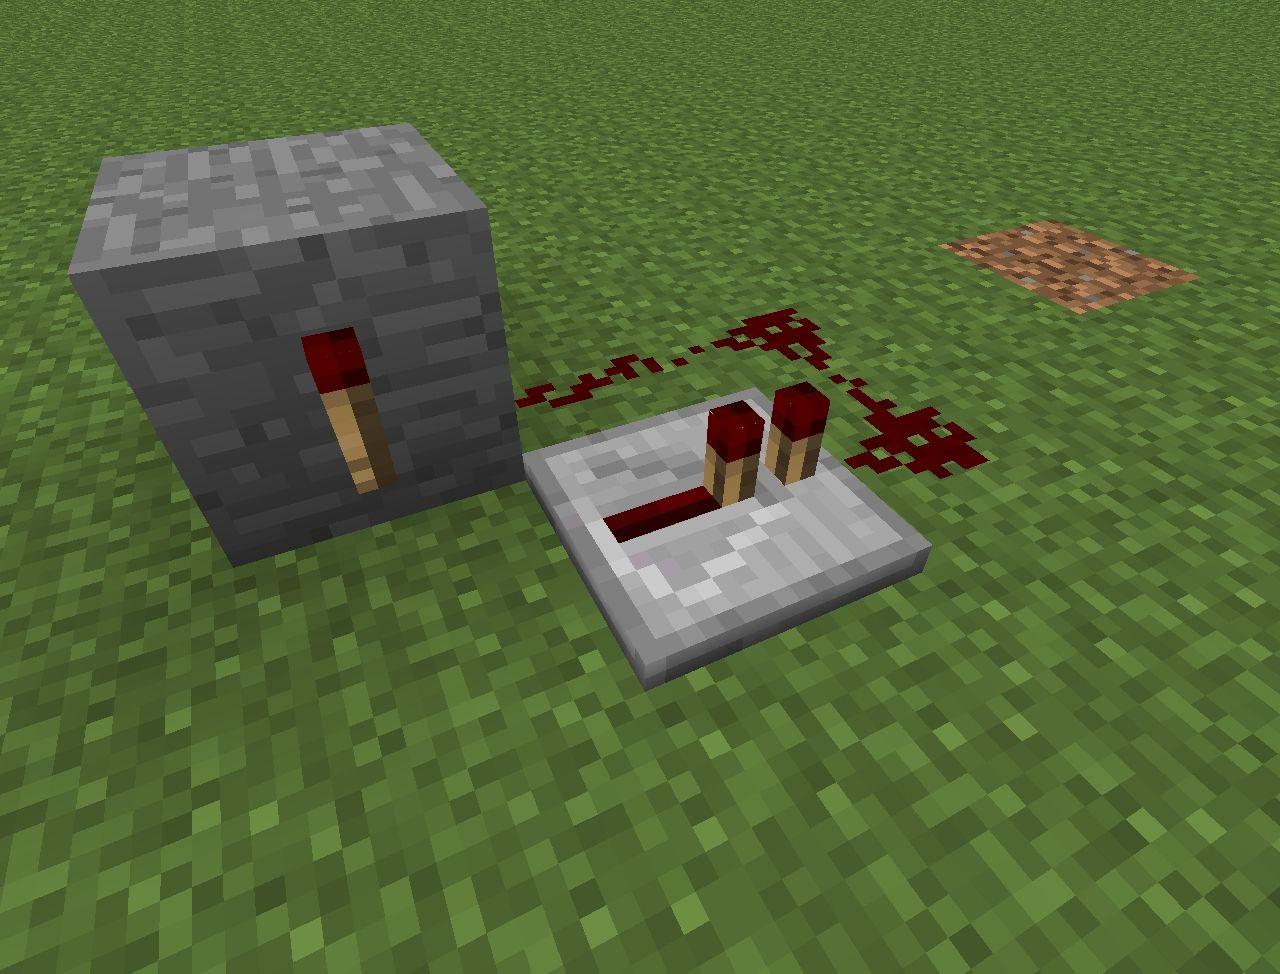 How to make a basic redstone clock minecraft blog